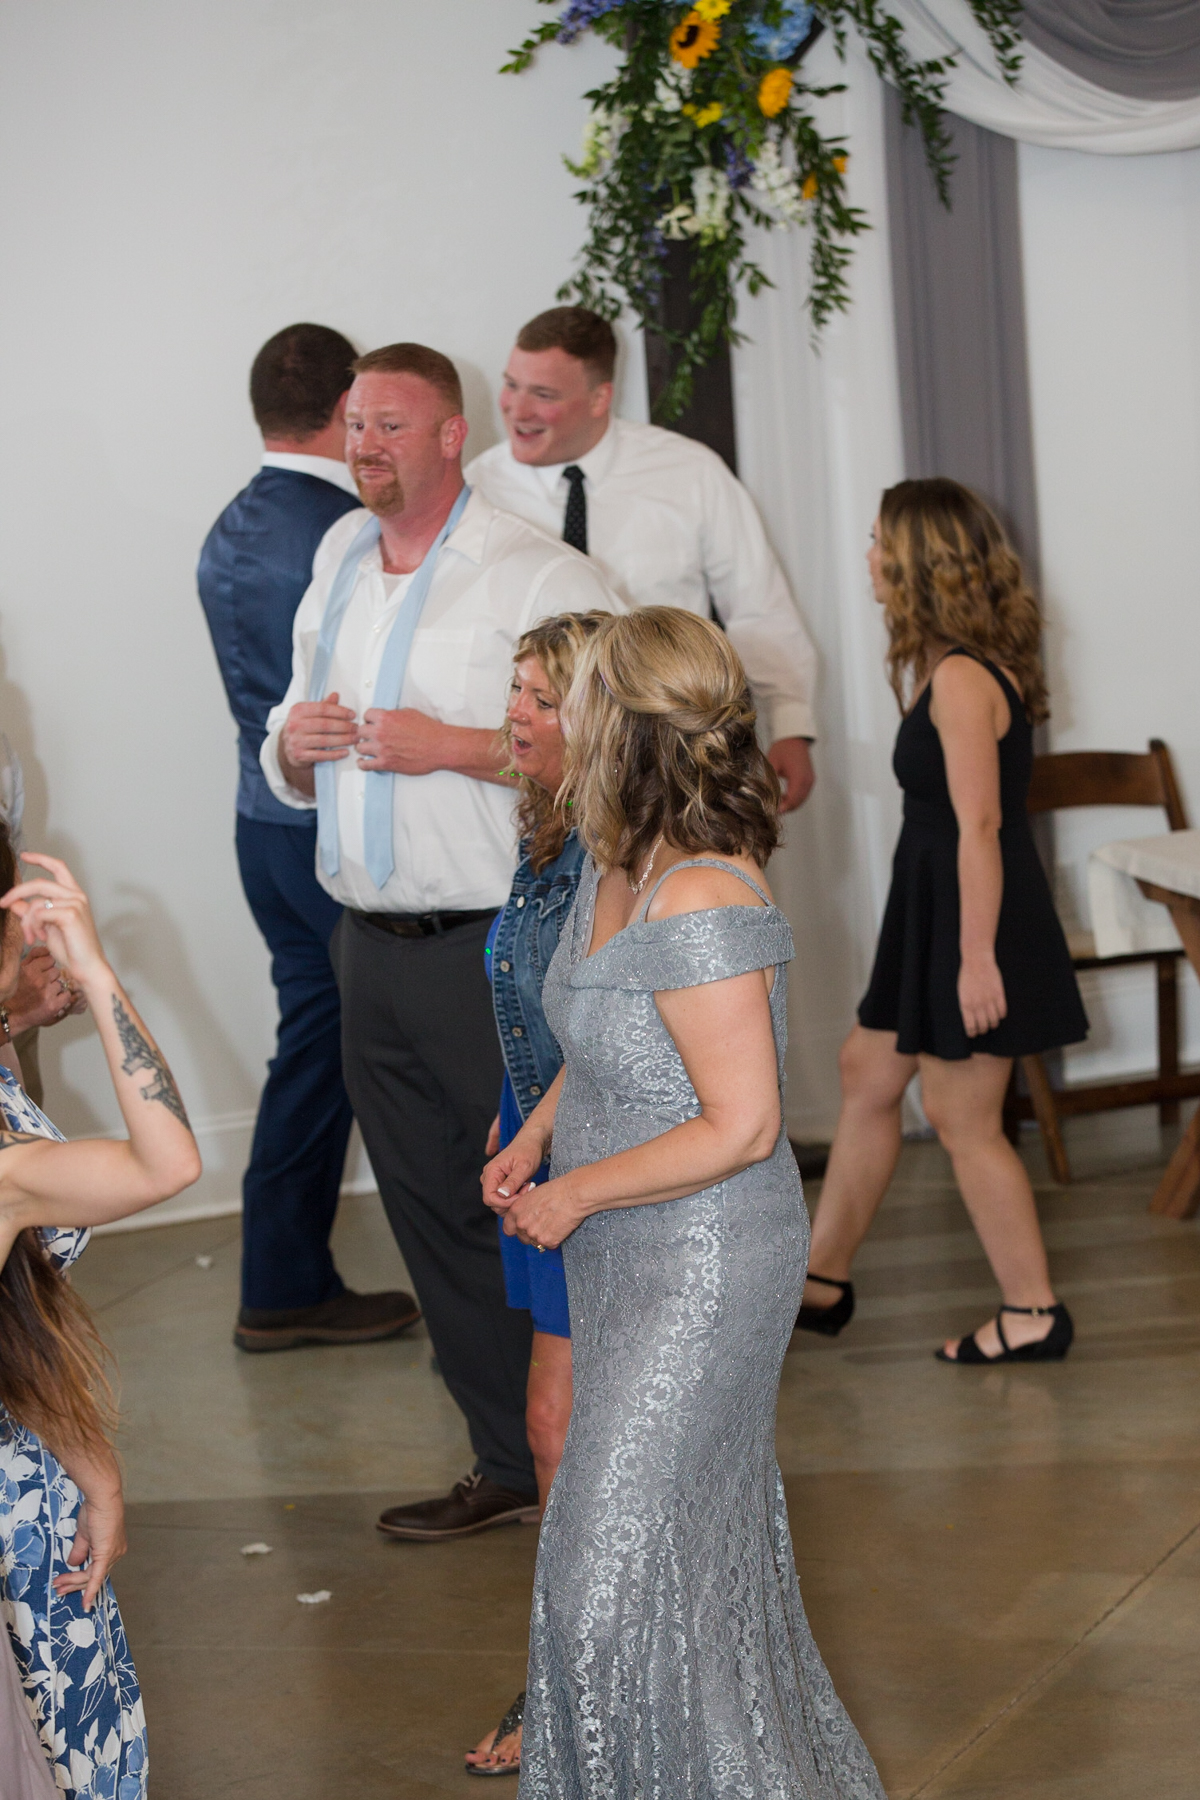 The-venue-at-white-oak-farms-wedding-nashville-wedding-photographers-0340.jpg